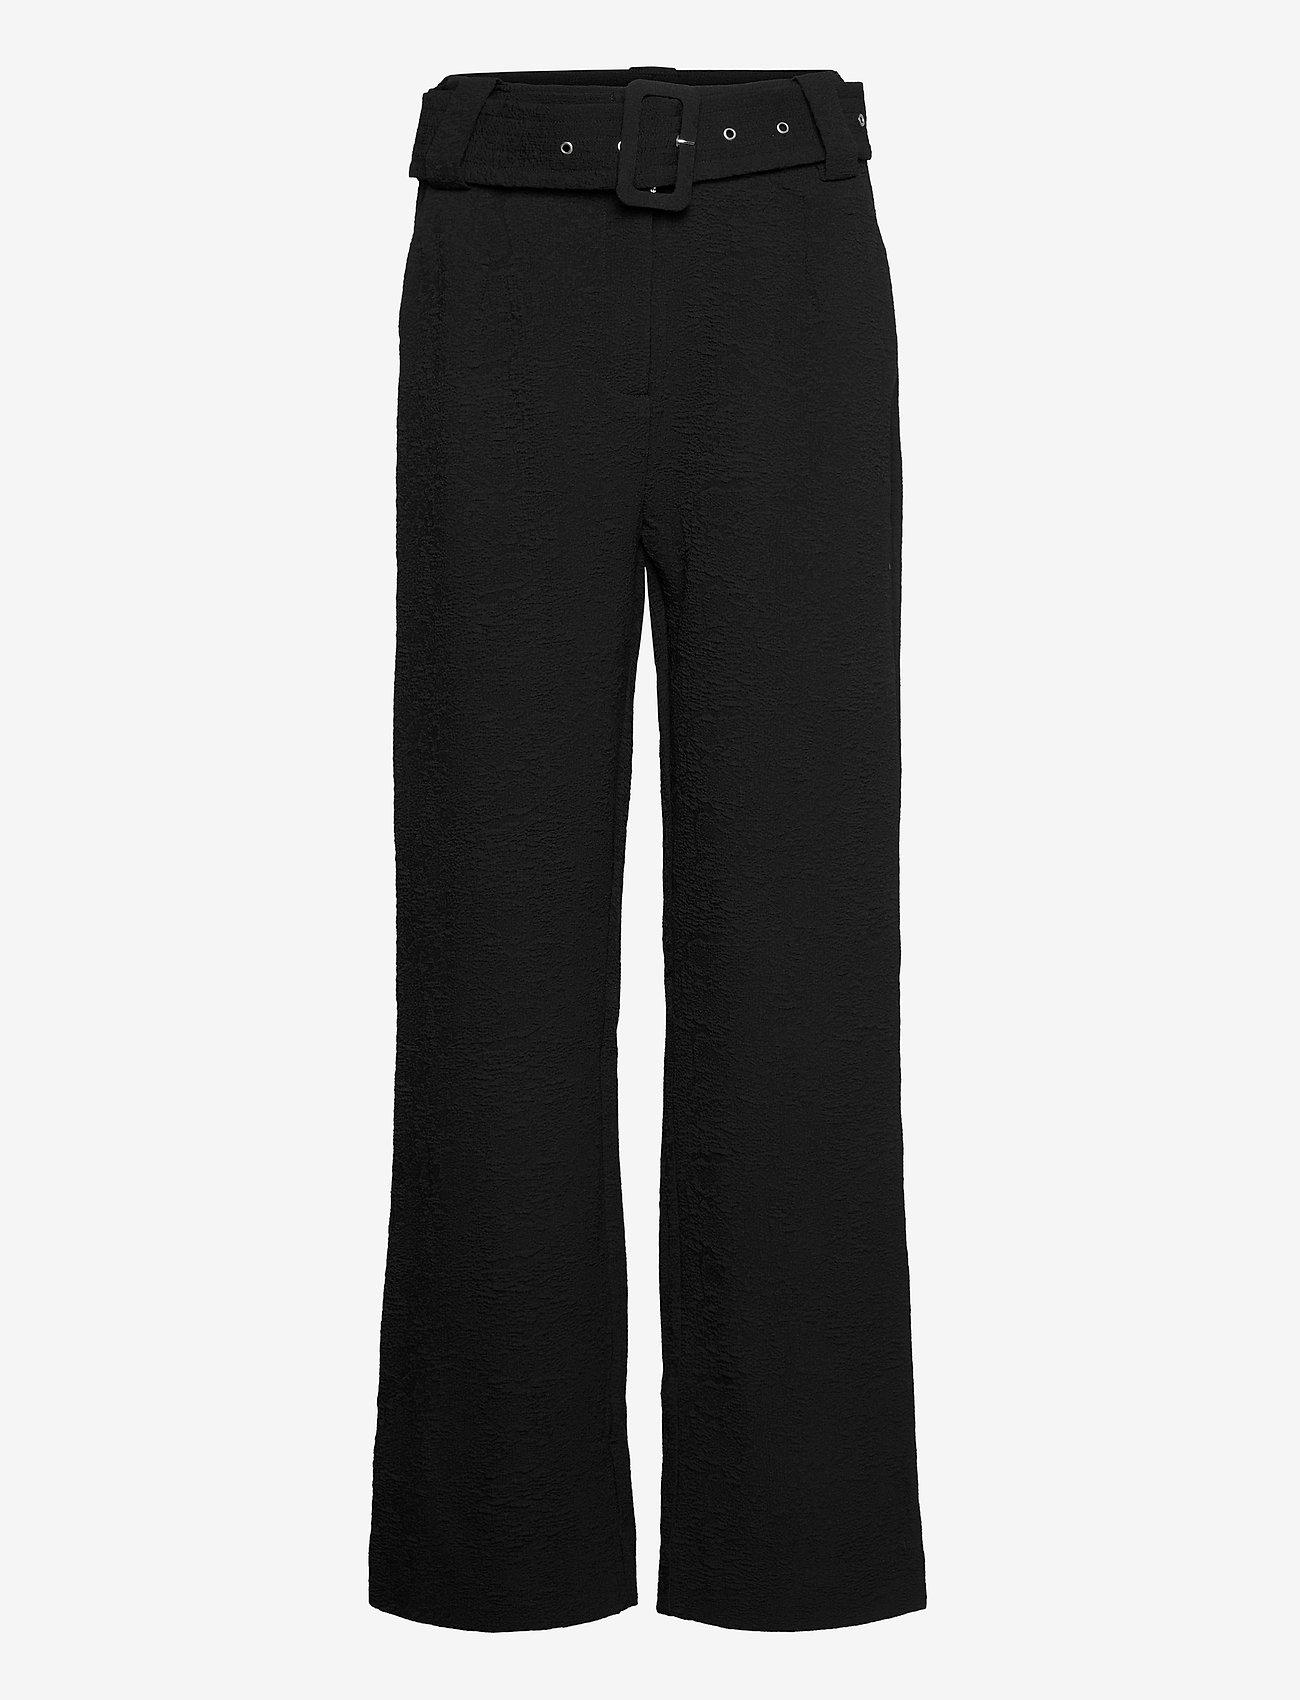 Just Female - Bonnie trousers - wide leg trousers - black - 1